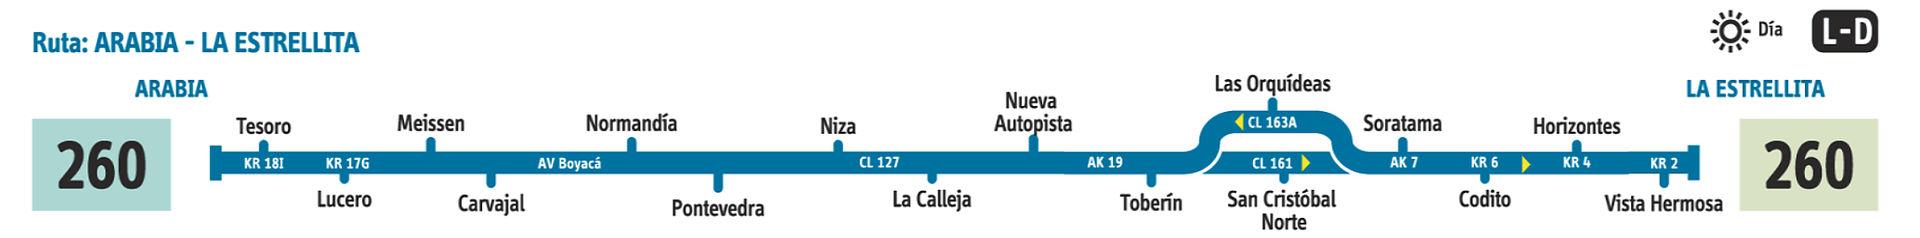 Ruta SITP: 260 La Estrellita ↔ Arabia [Urbana] 4